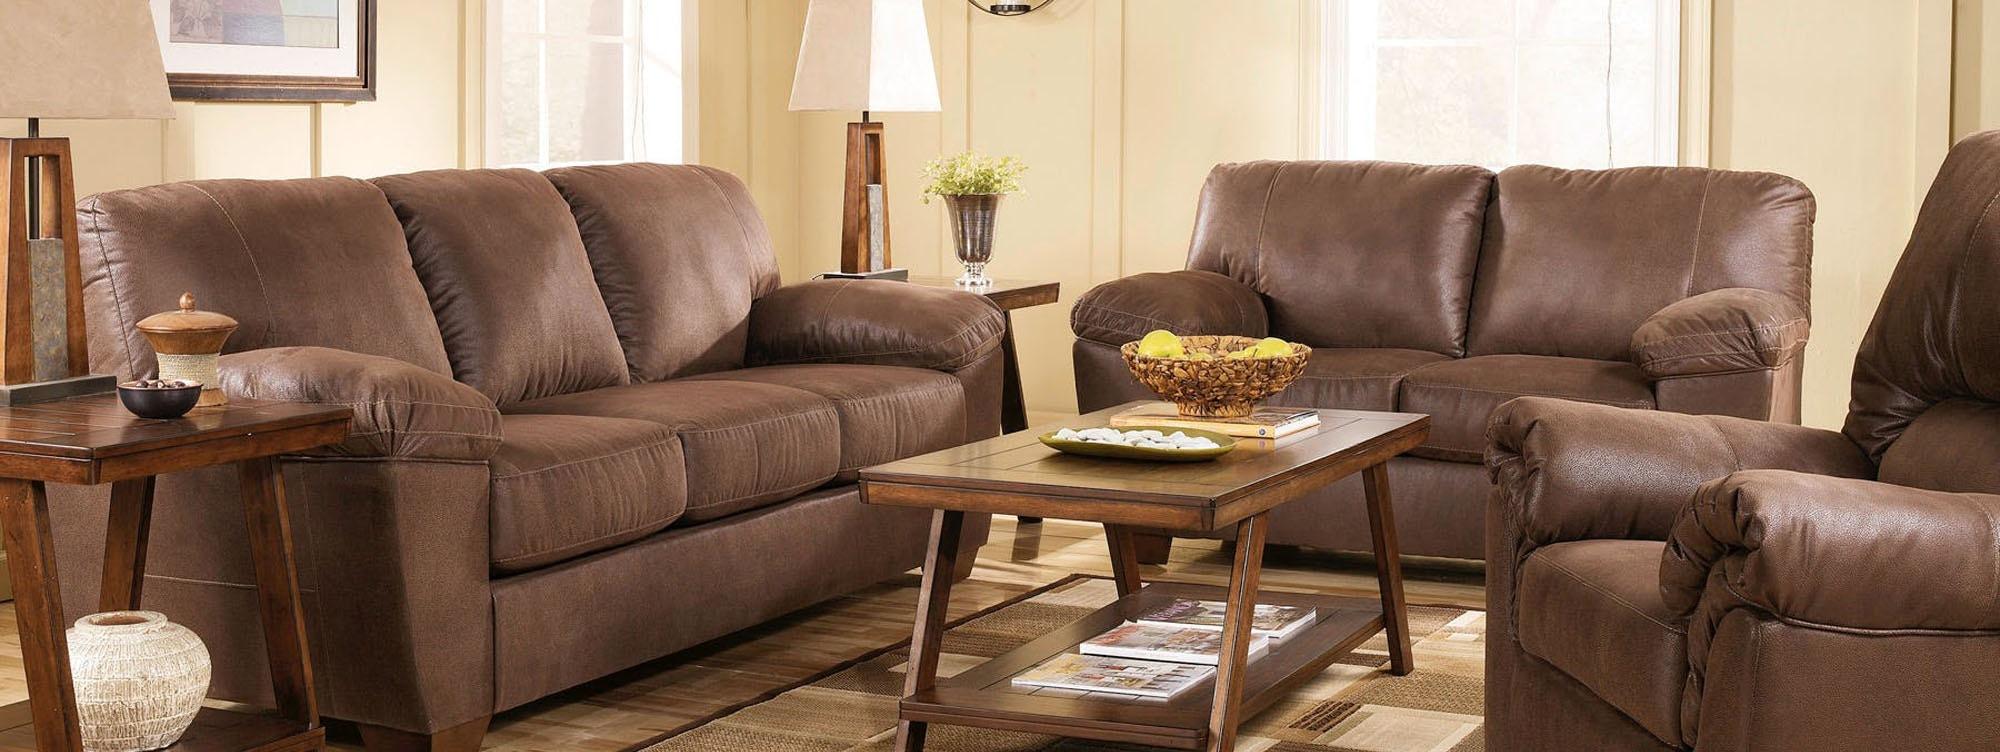 Shop For Amazon Furniture In Cincinnati And Dayton OH